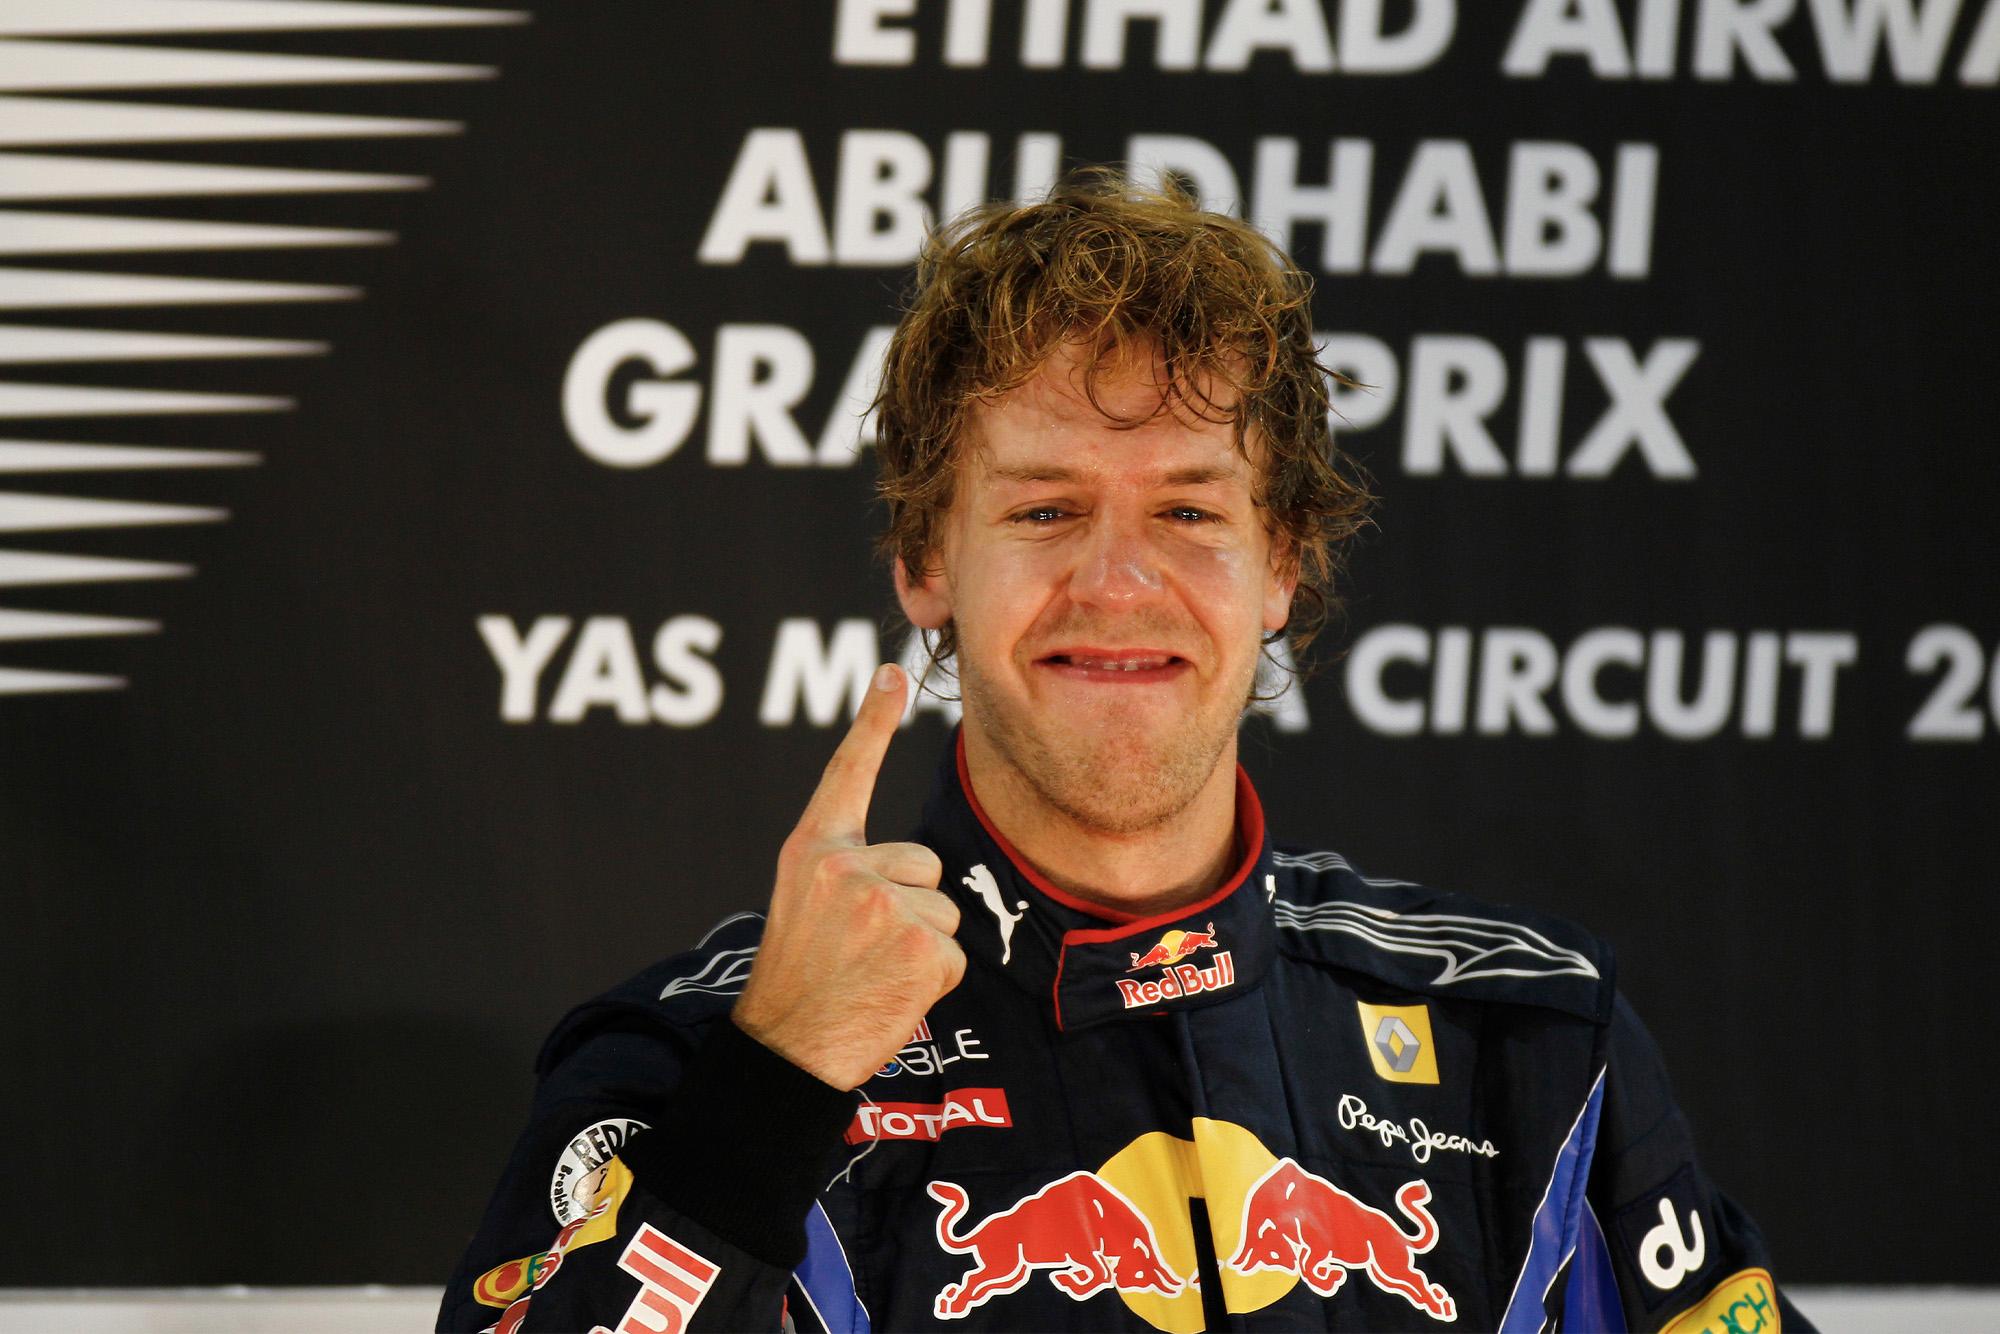 Sebastian Vettel celebrates winning the 2010 world championship and Abu Dhabi Grand Prix